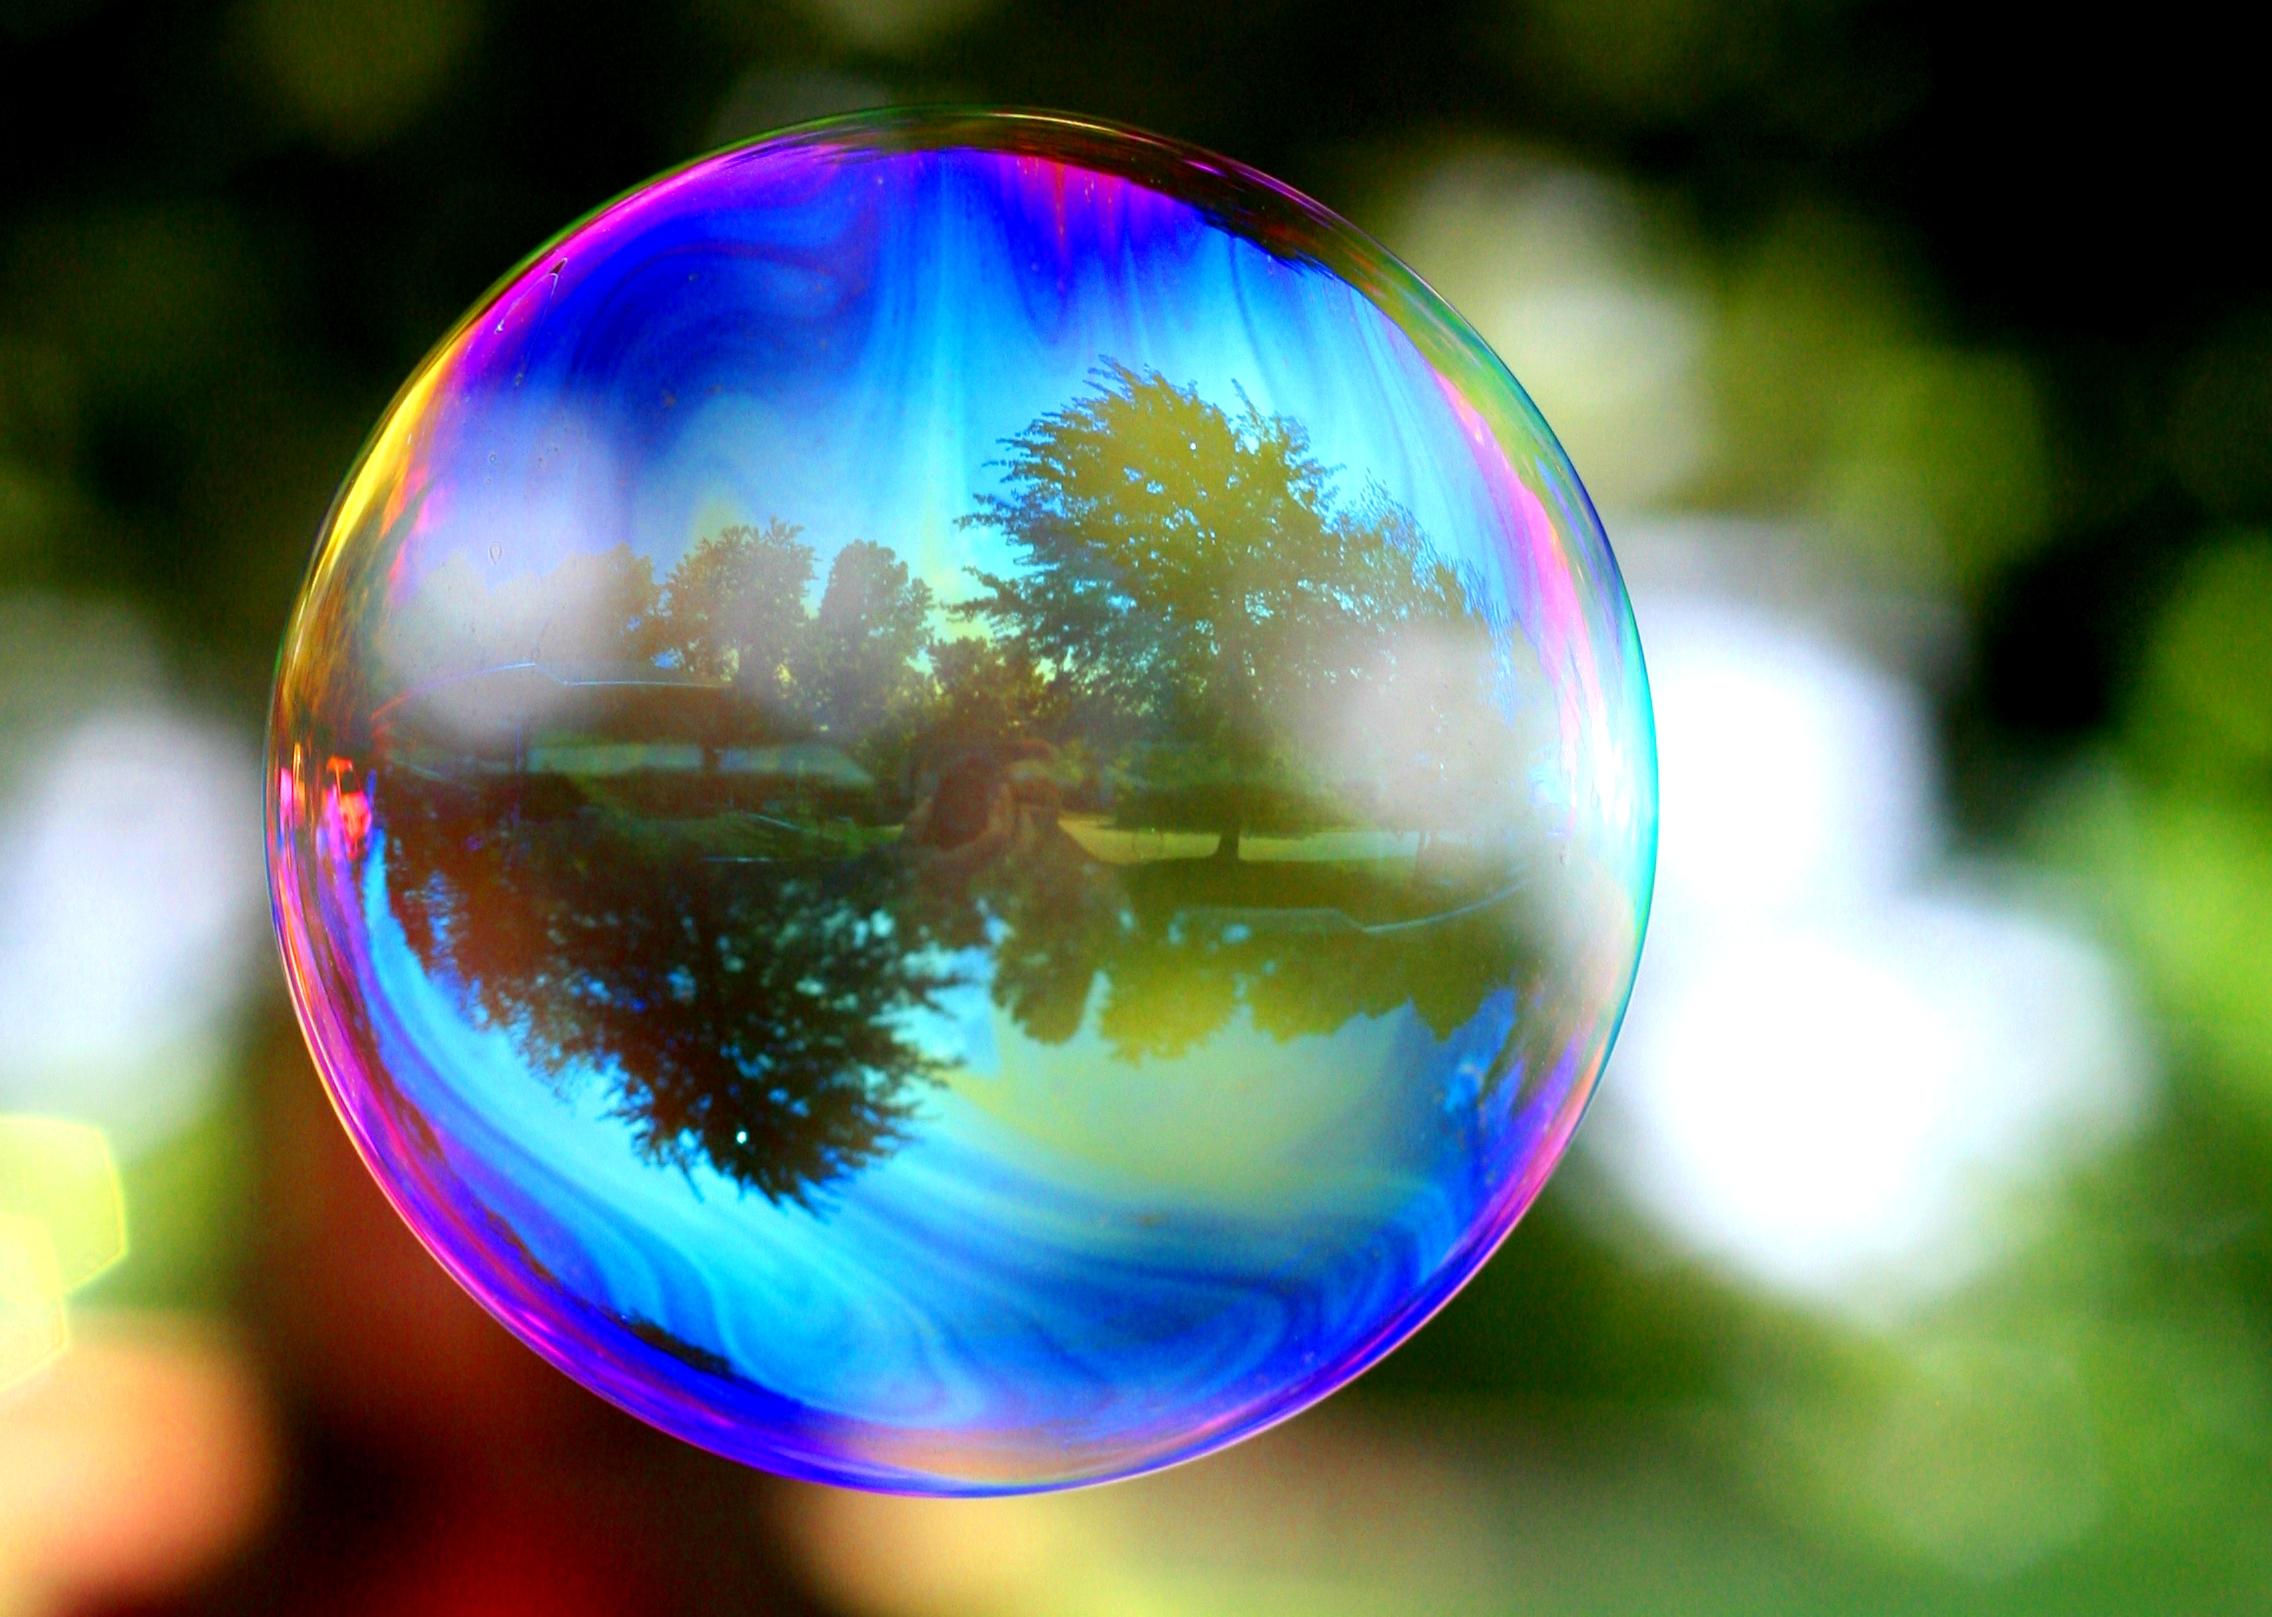 Catching Bubbles | Jabbok Dawn